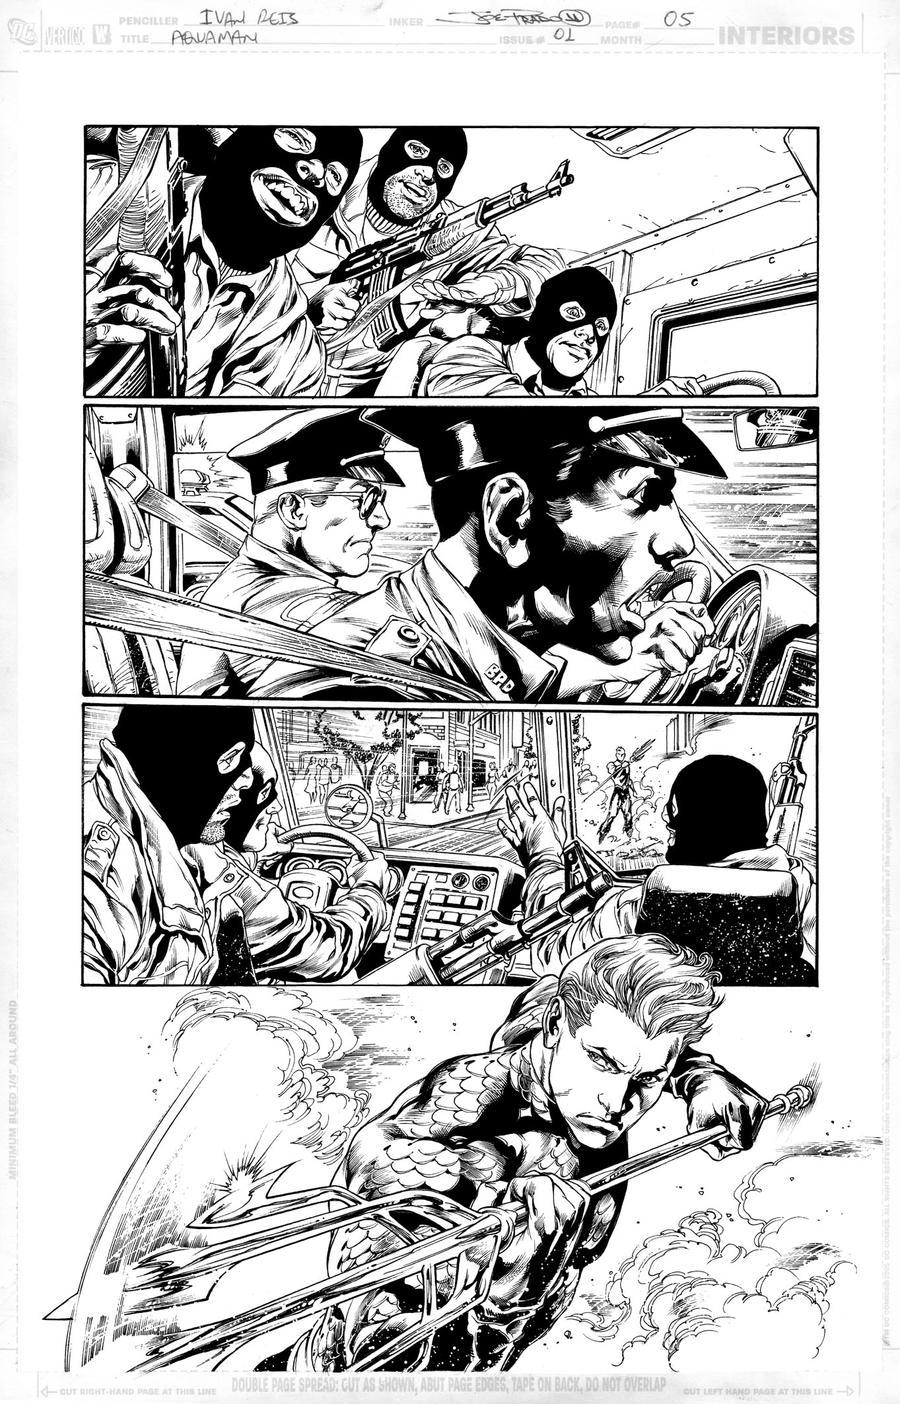 AQUAMAN Issue 01 Page 05 by JoePrado2010